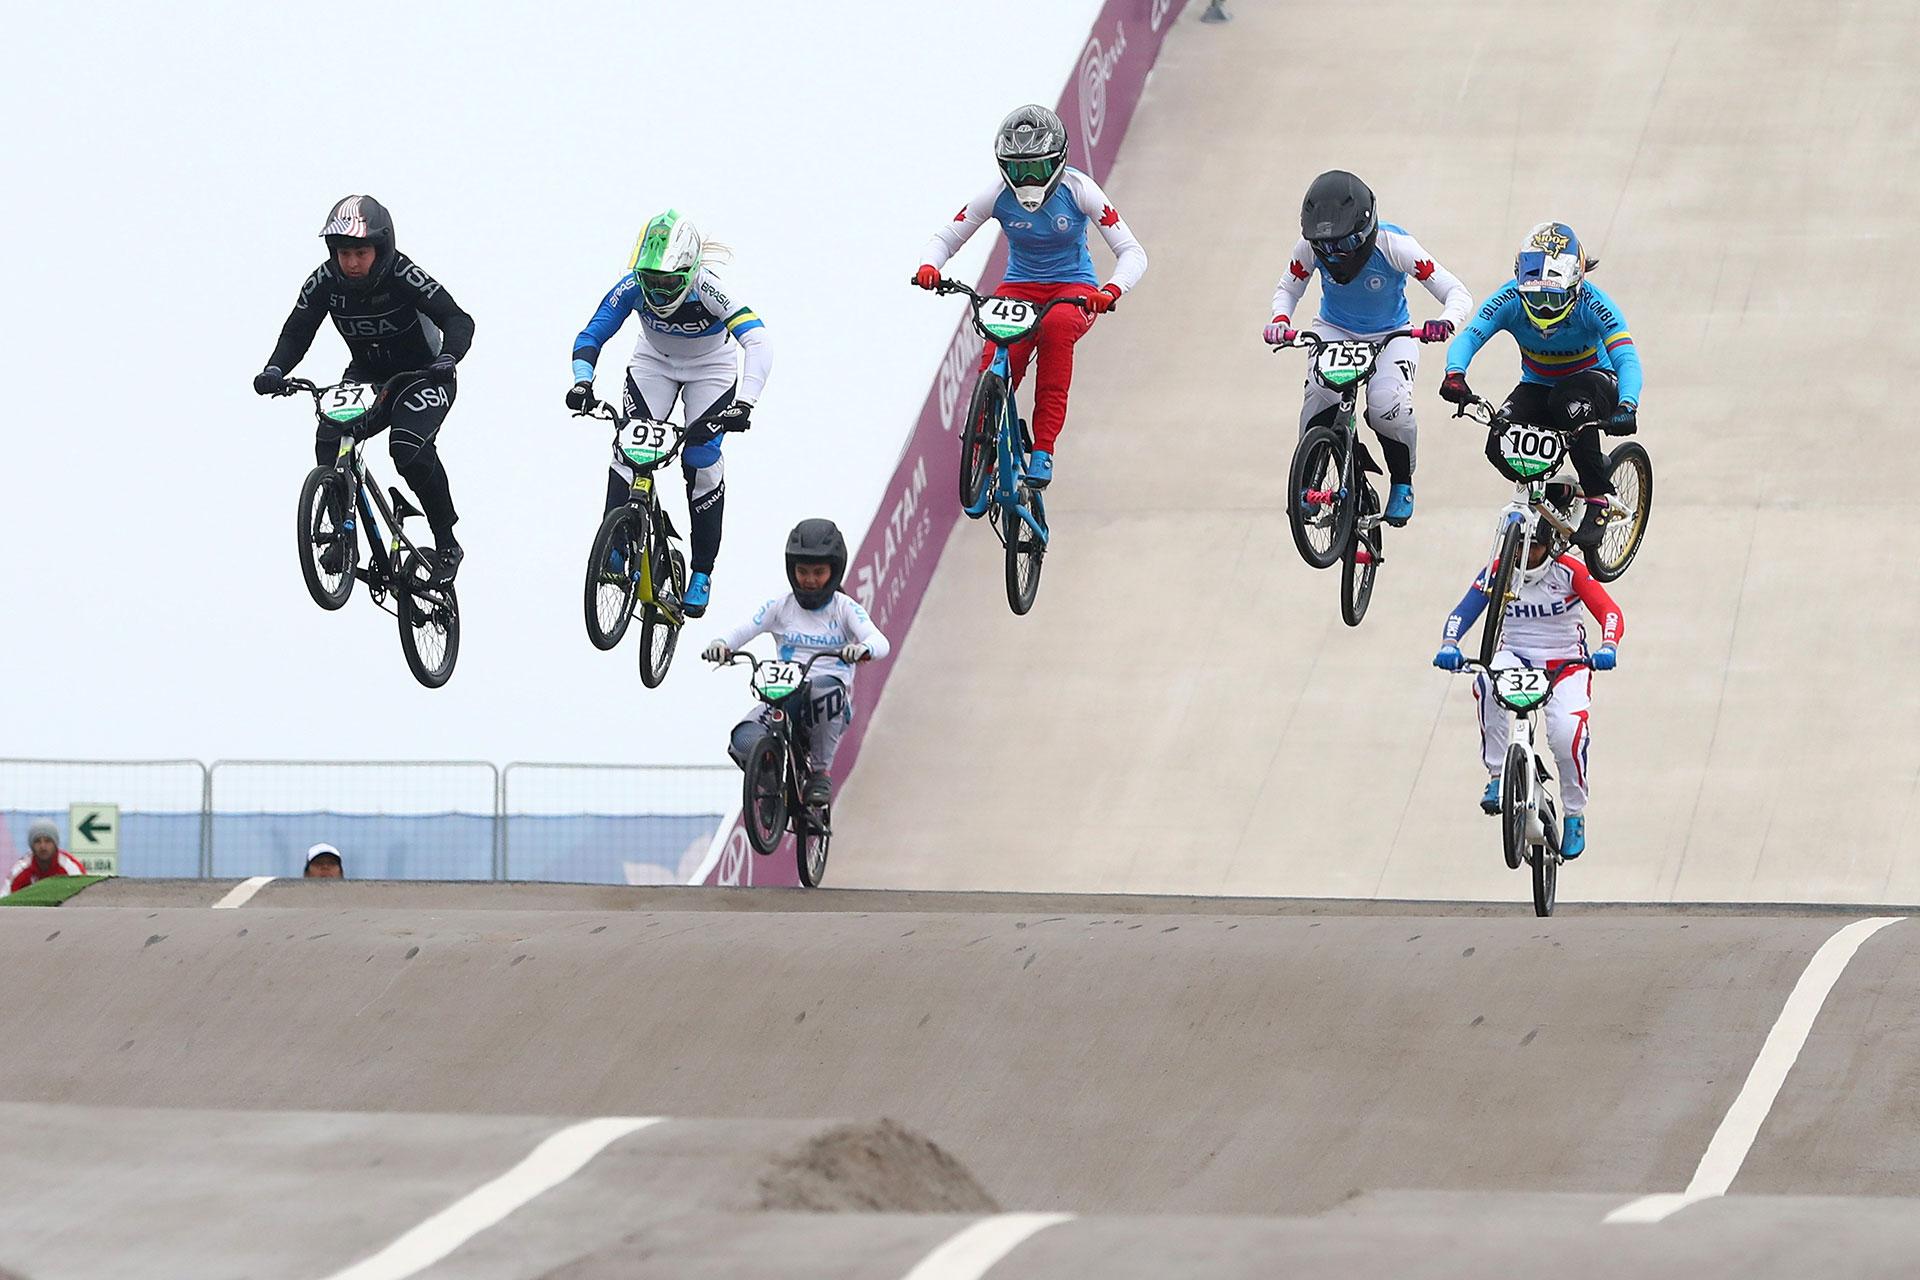 XVIII Pan American Games - Lima 2019 - Cycling BMX - Women Quarterfinal  - Costa Verde Beach Circuit, Lima, Peru - August 9, 2019. Athletes compete. REUTERS/Pilar Olivares